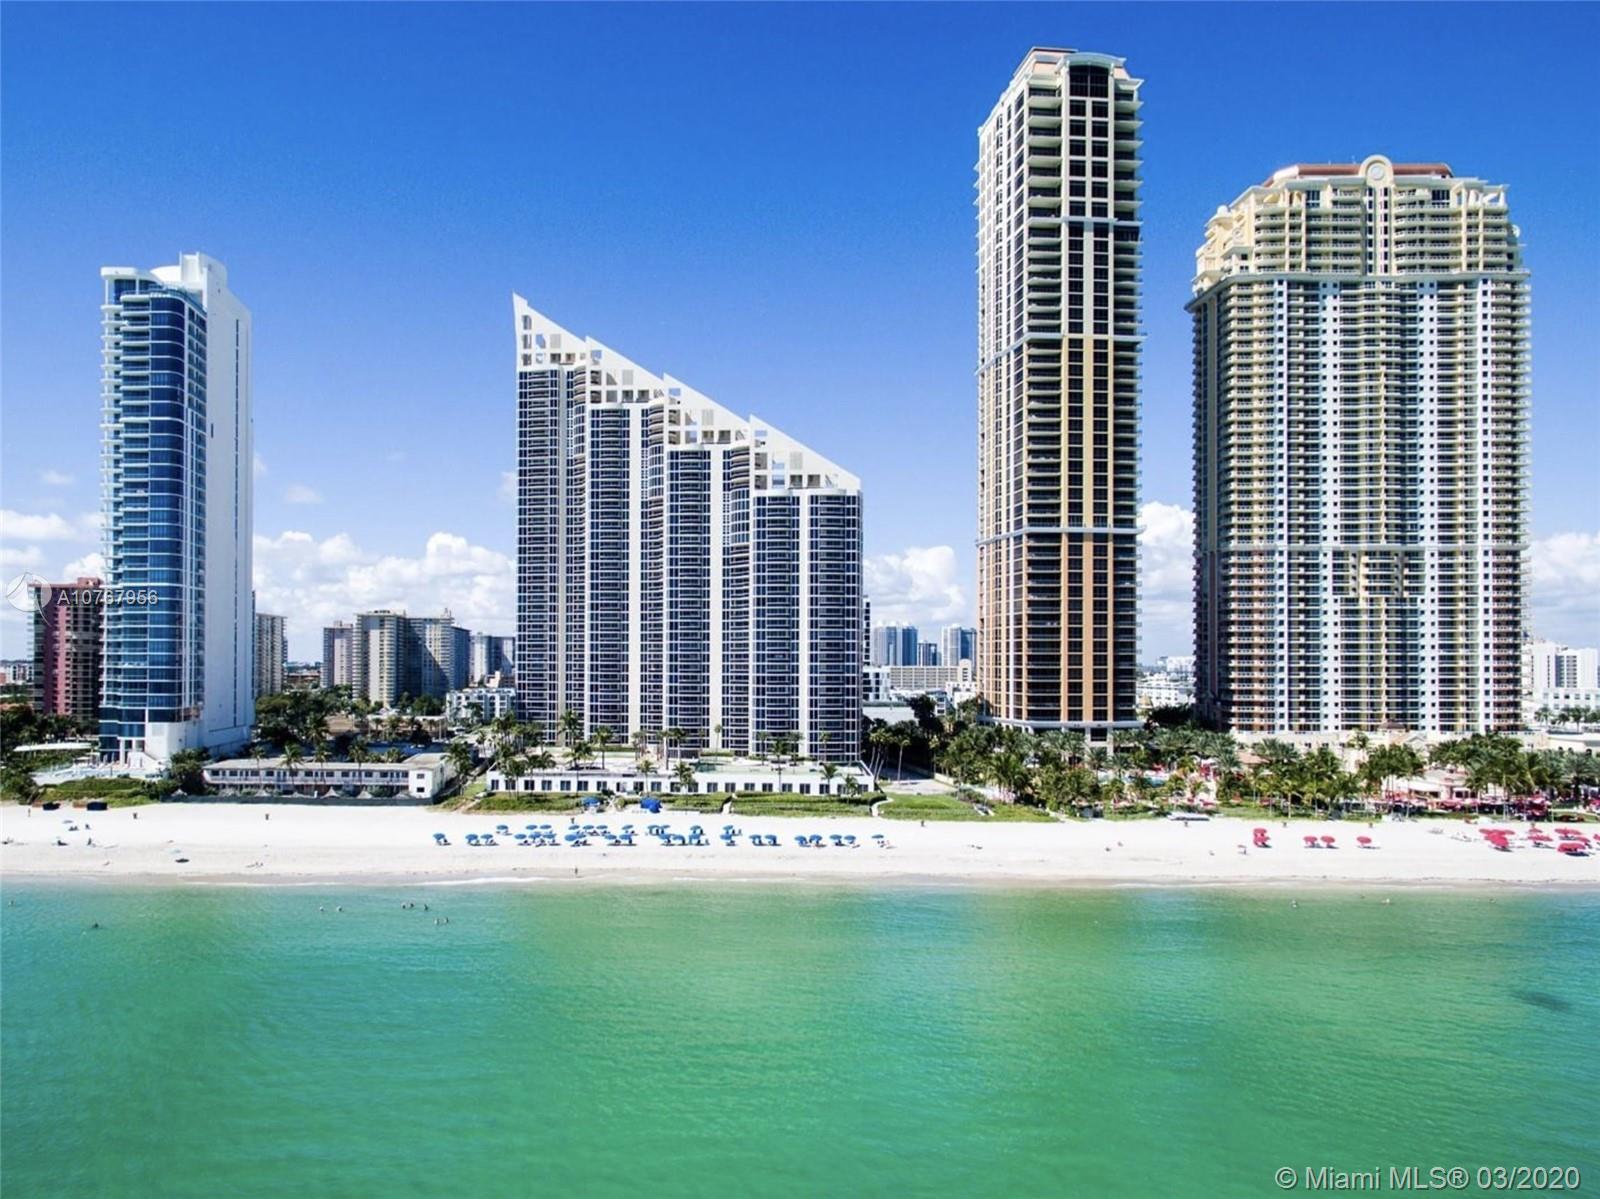 17555 Collins Ave #TS-2, Sunny Isles Beach, FL 33160 - Sunny Isles Beach, FL real estate listing